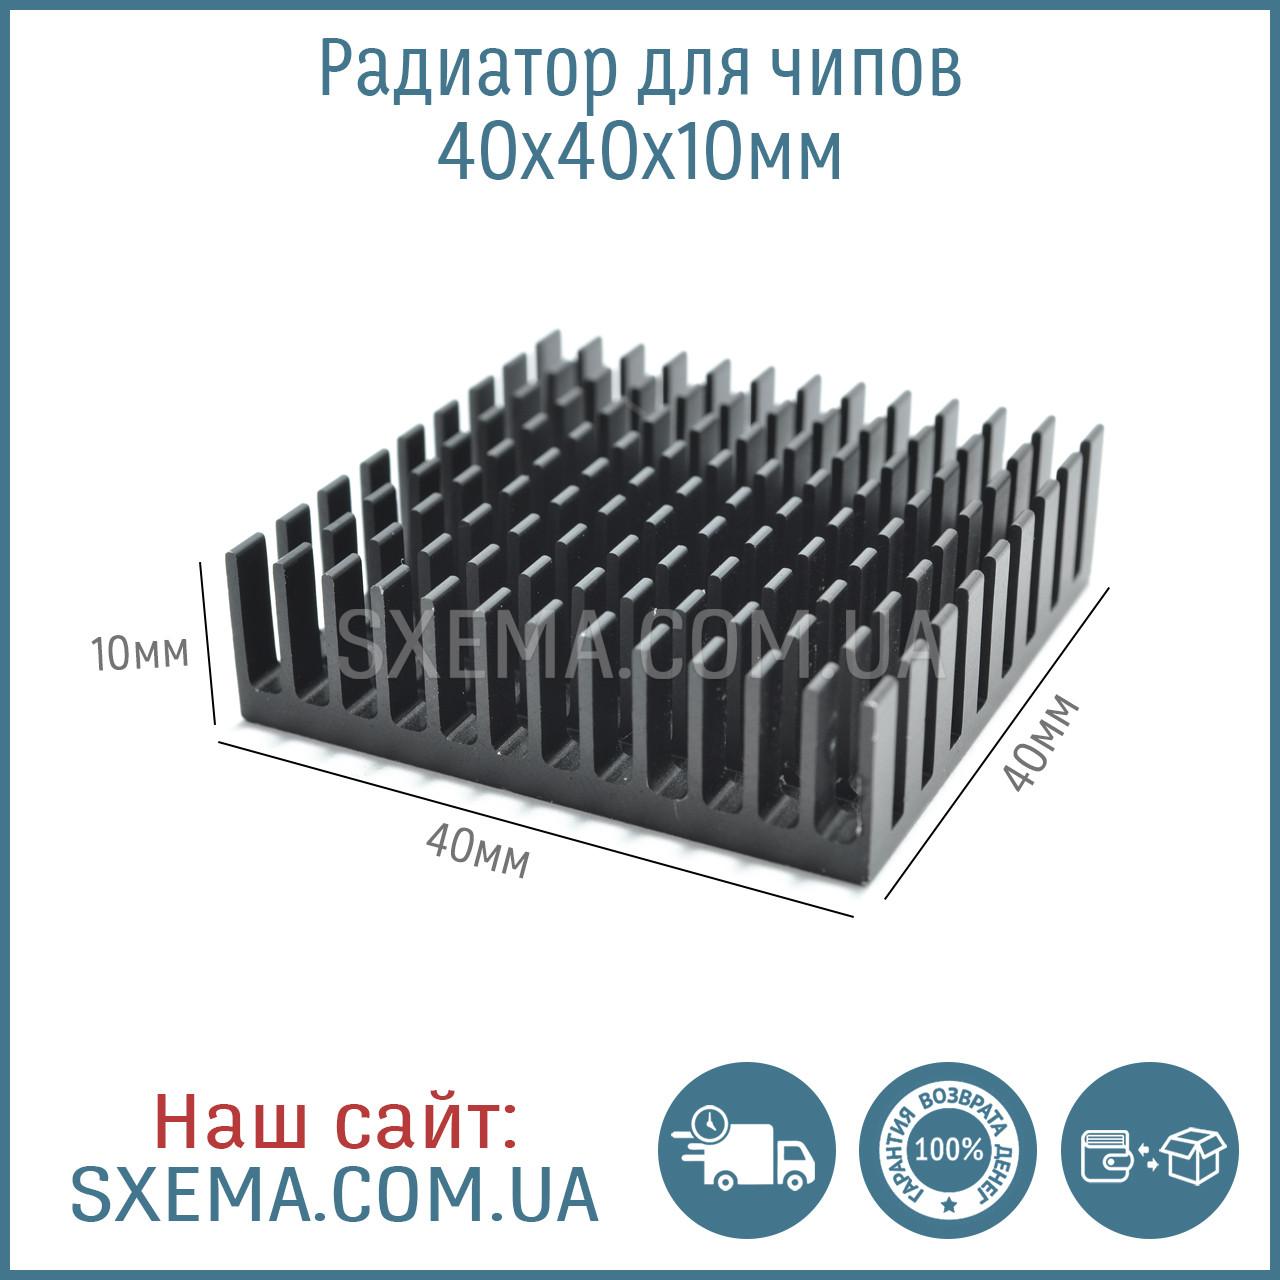 Радиатор для чипов 40х40х11мм алюминиевый